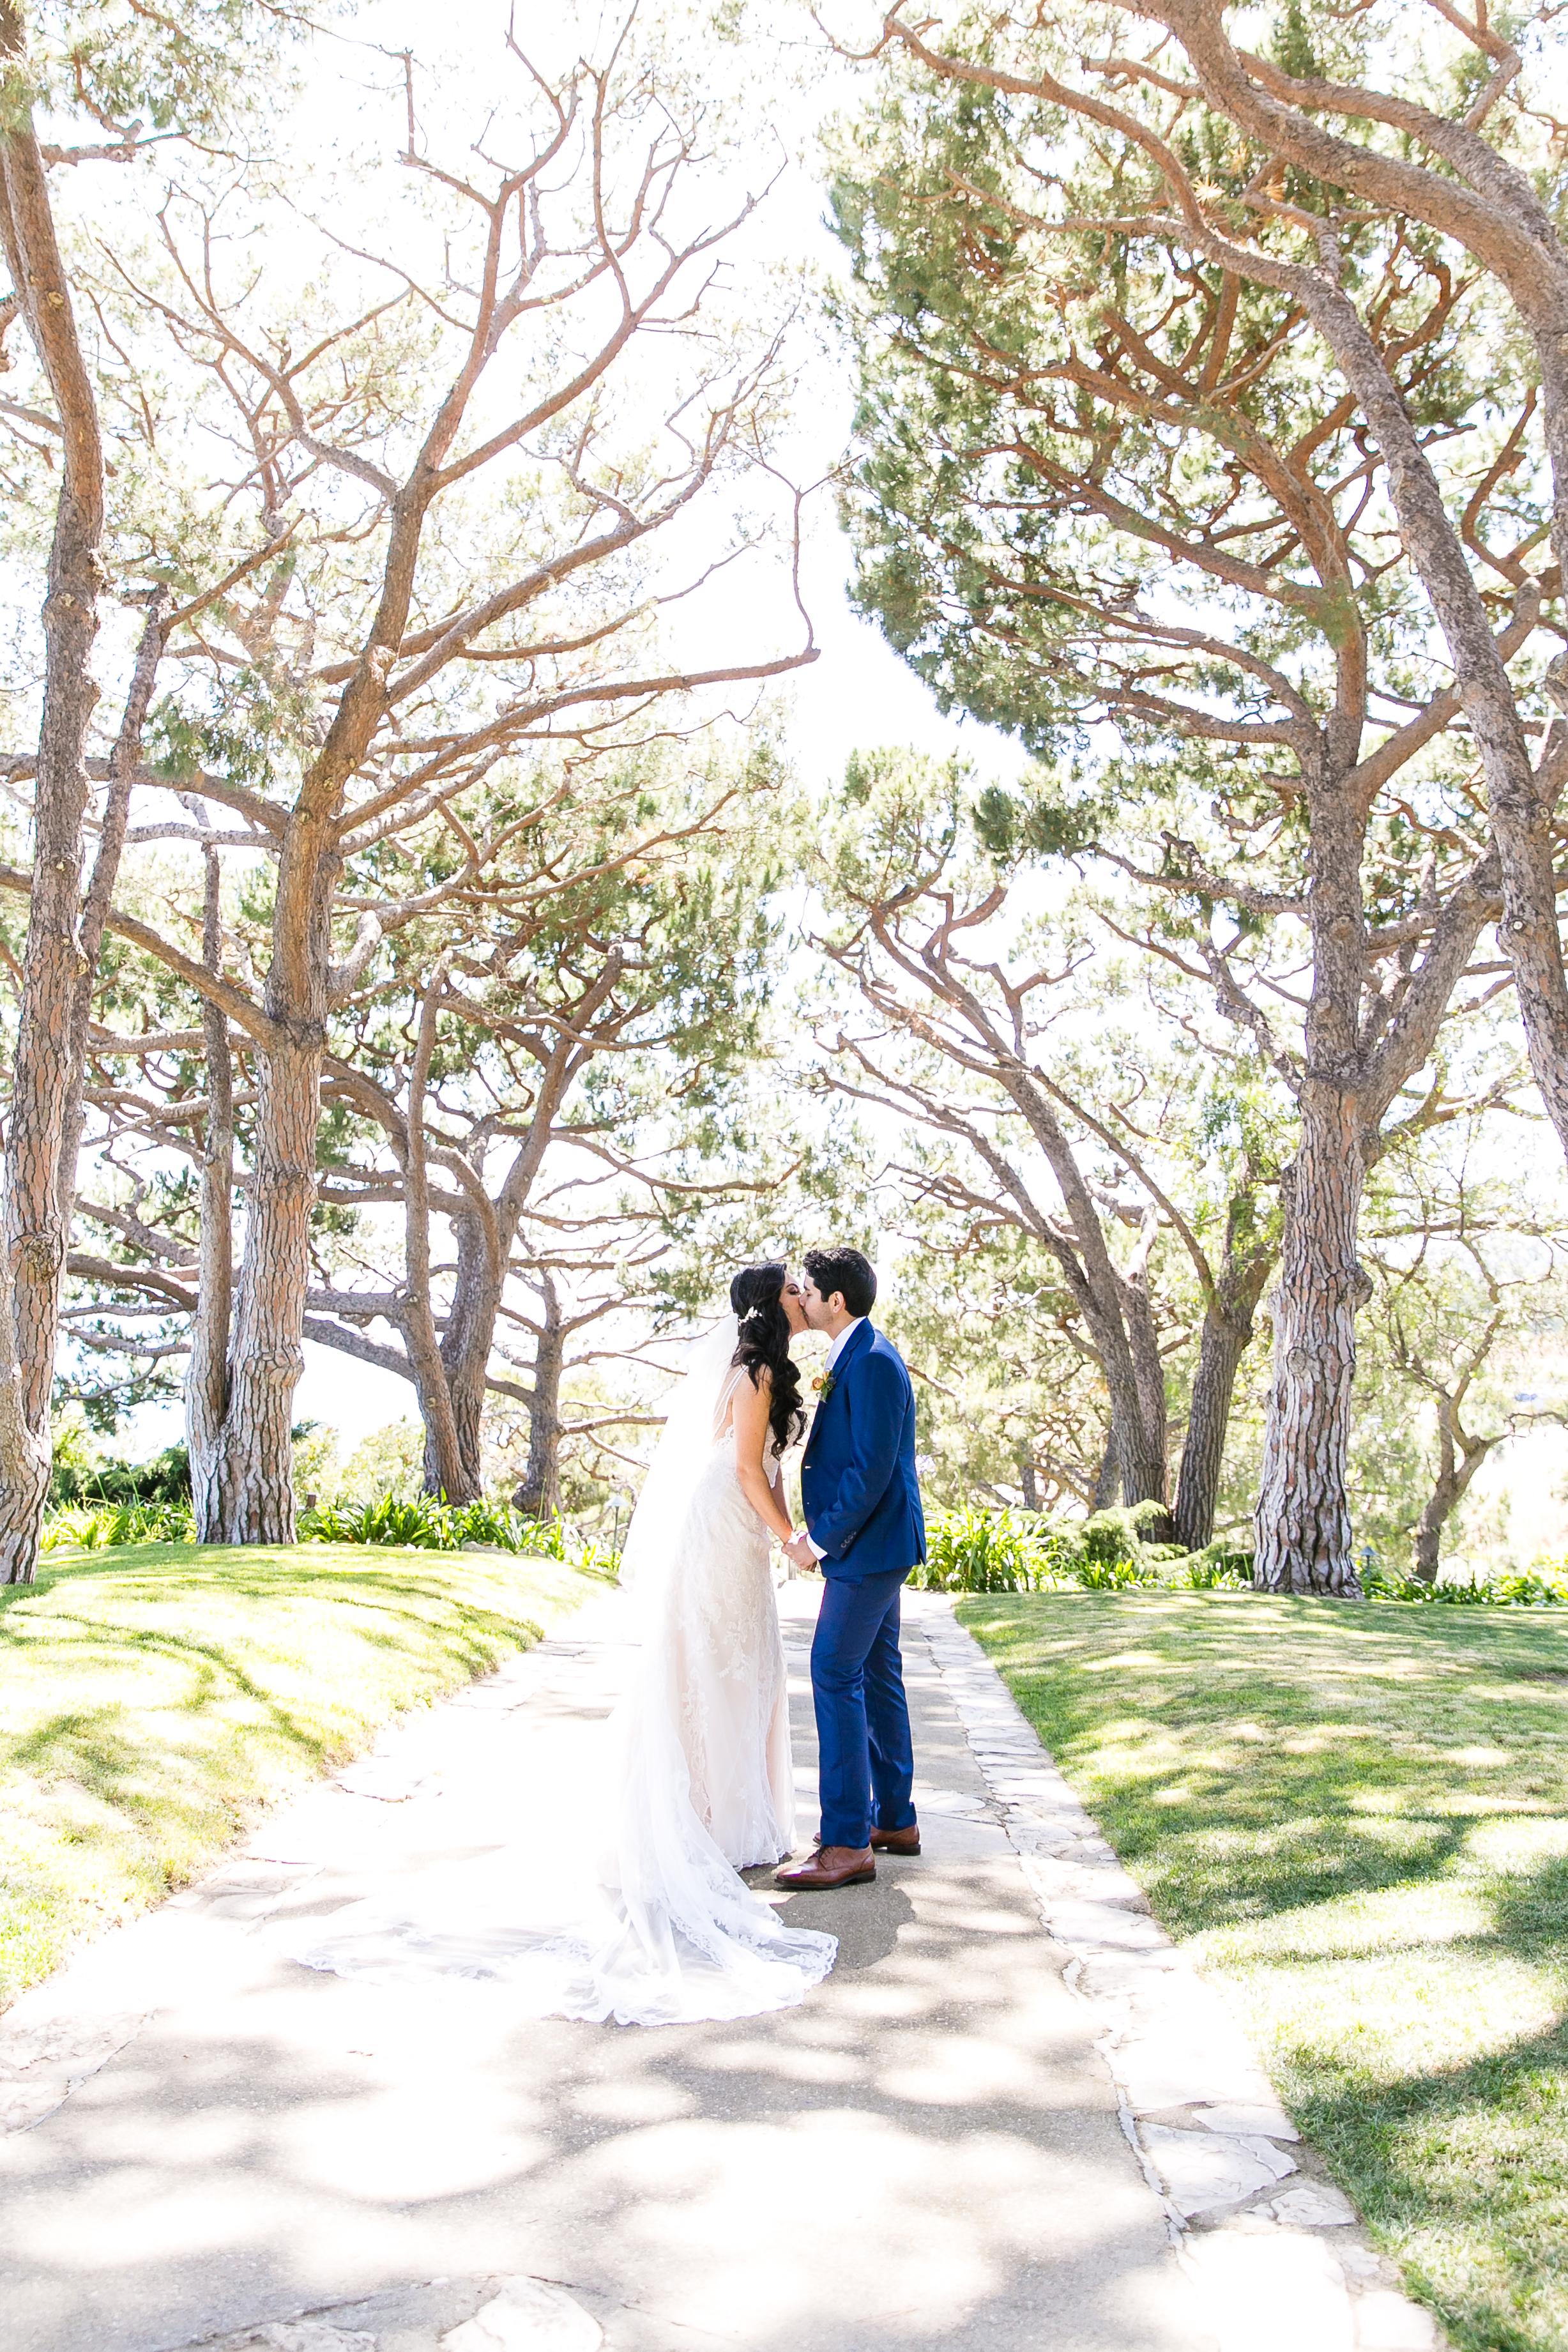 2019_05_24_Wedding_Barajas_0351.jpg